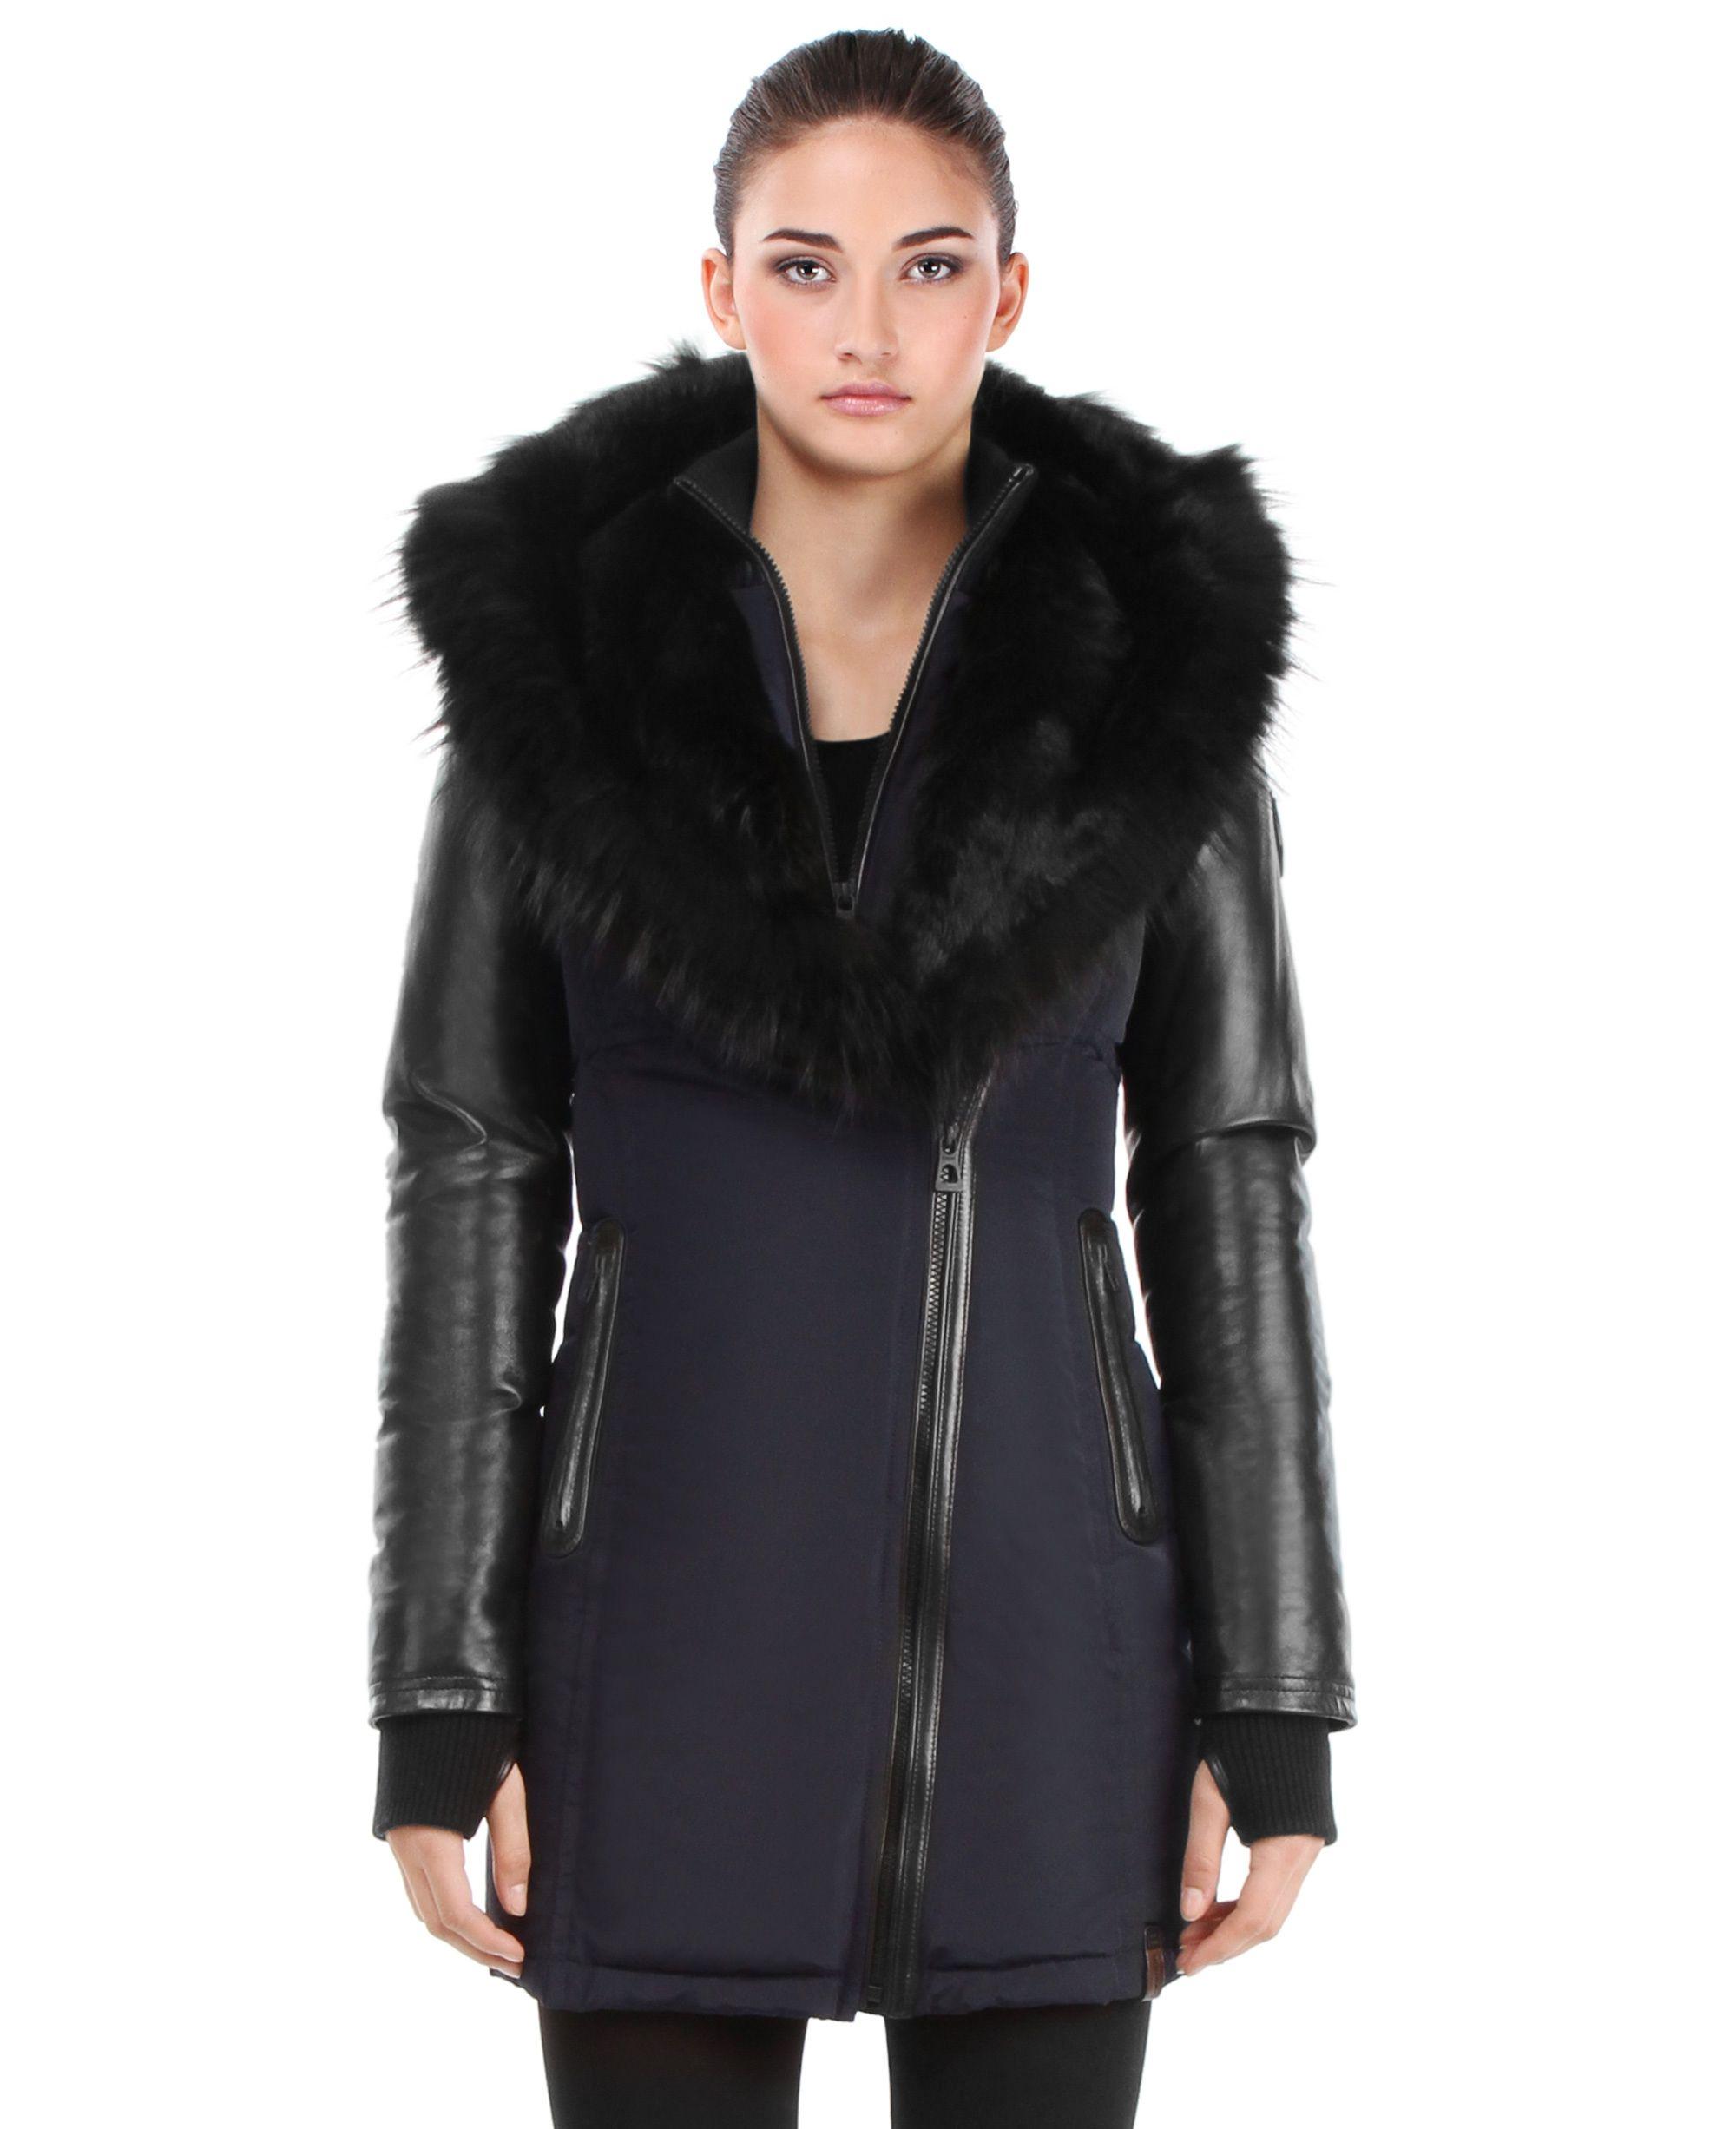 a06e9a5bbf Dream Coat! //RUDSAK Outerwear (NAVY/BLACK, MEMORY FABRIC/GENUINE ...